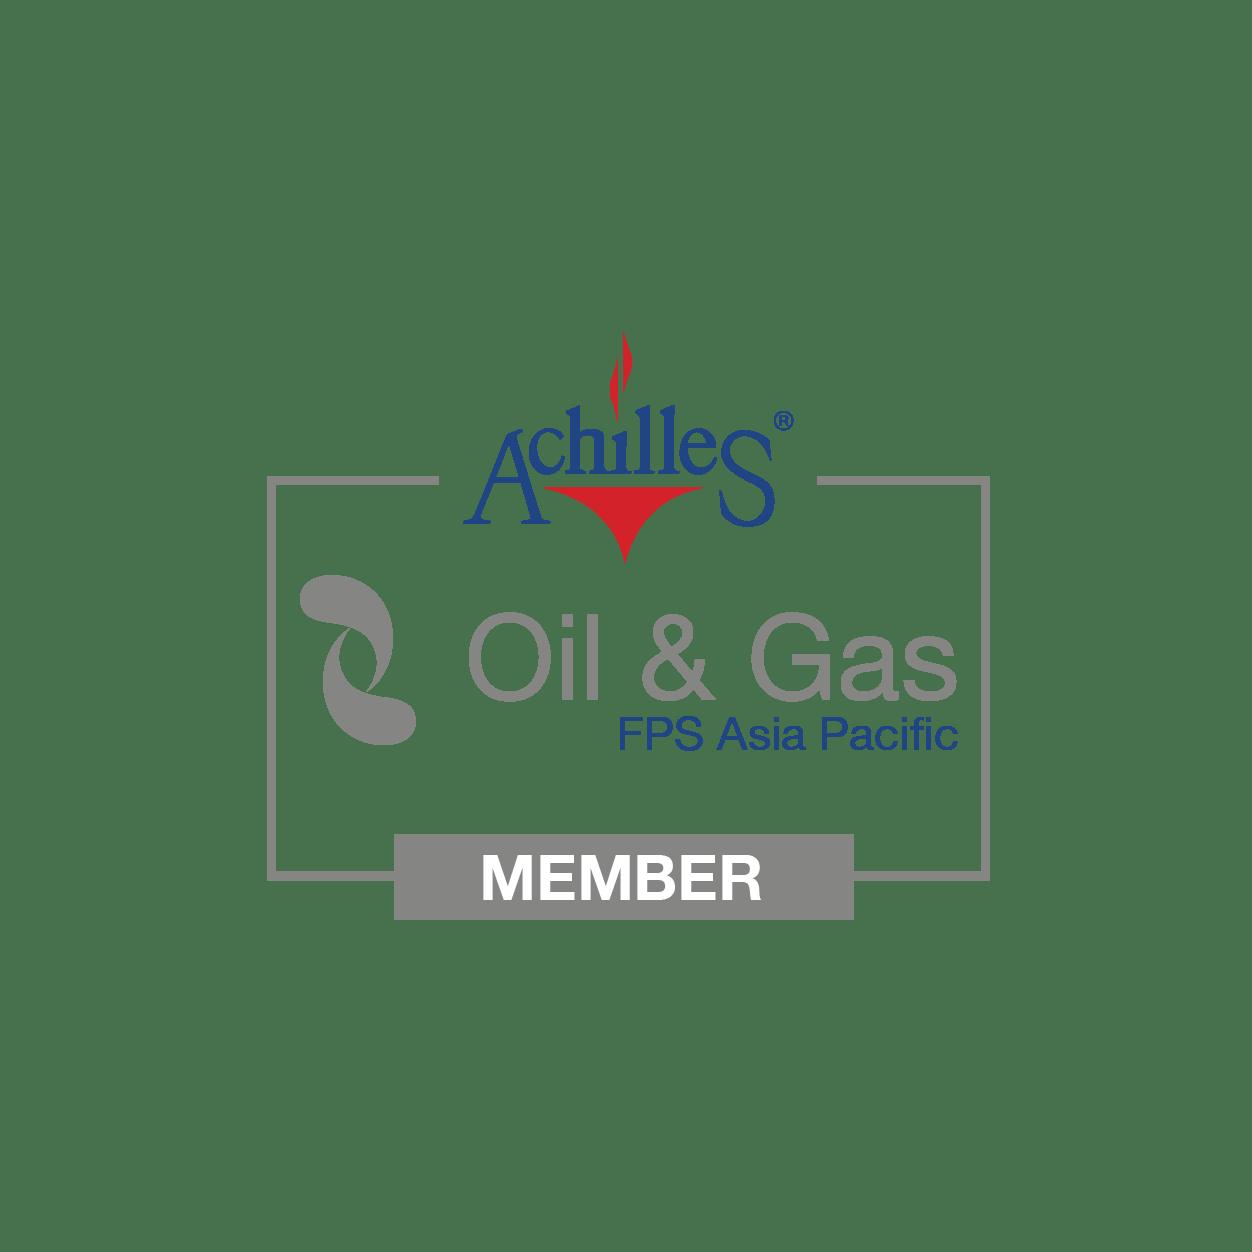 Achilles - Tango Oilfield Solutions